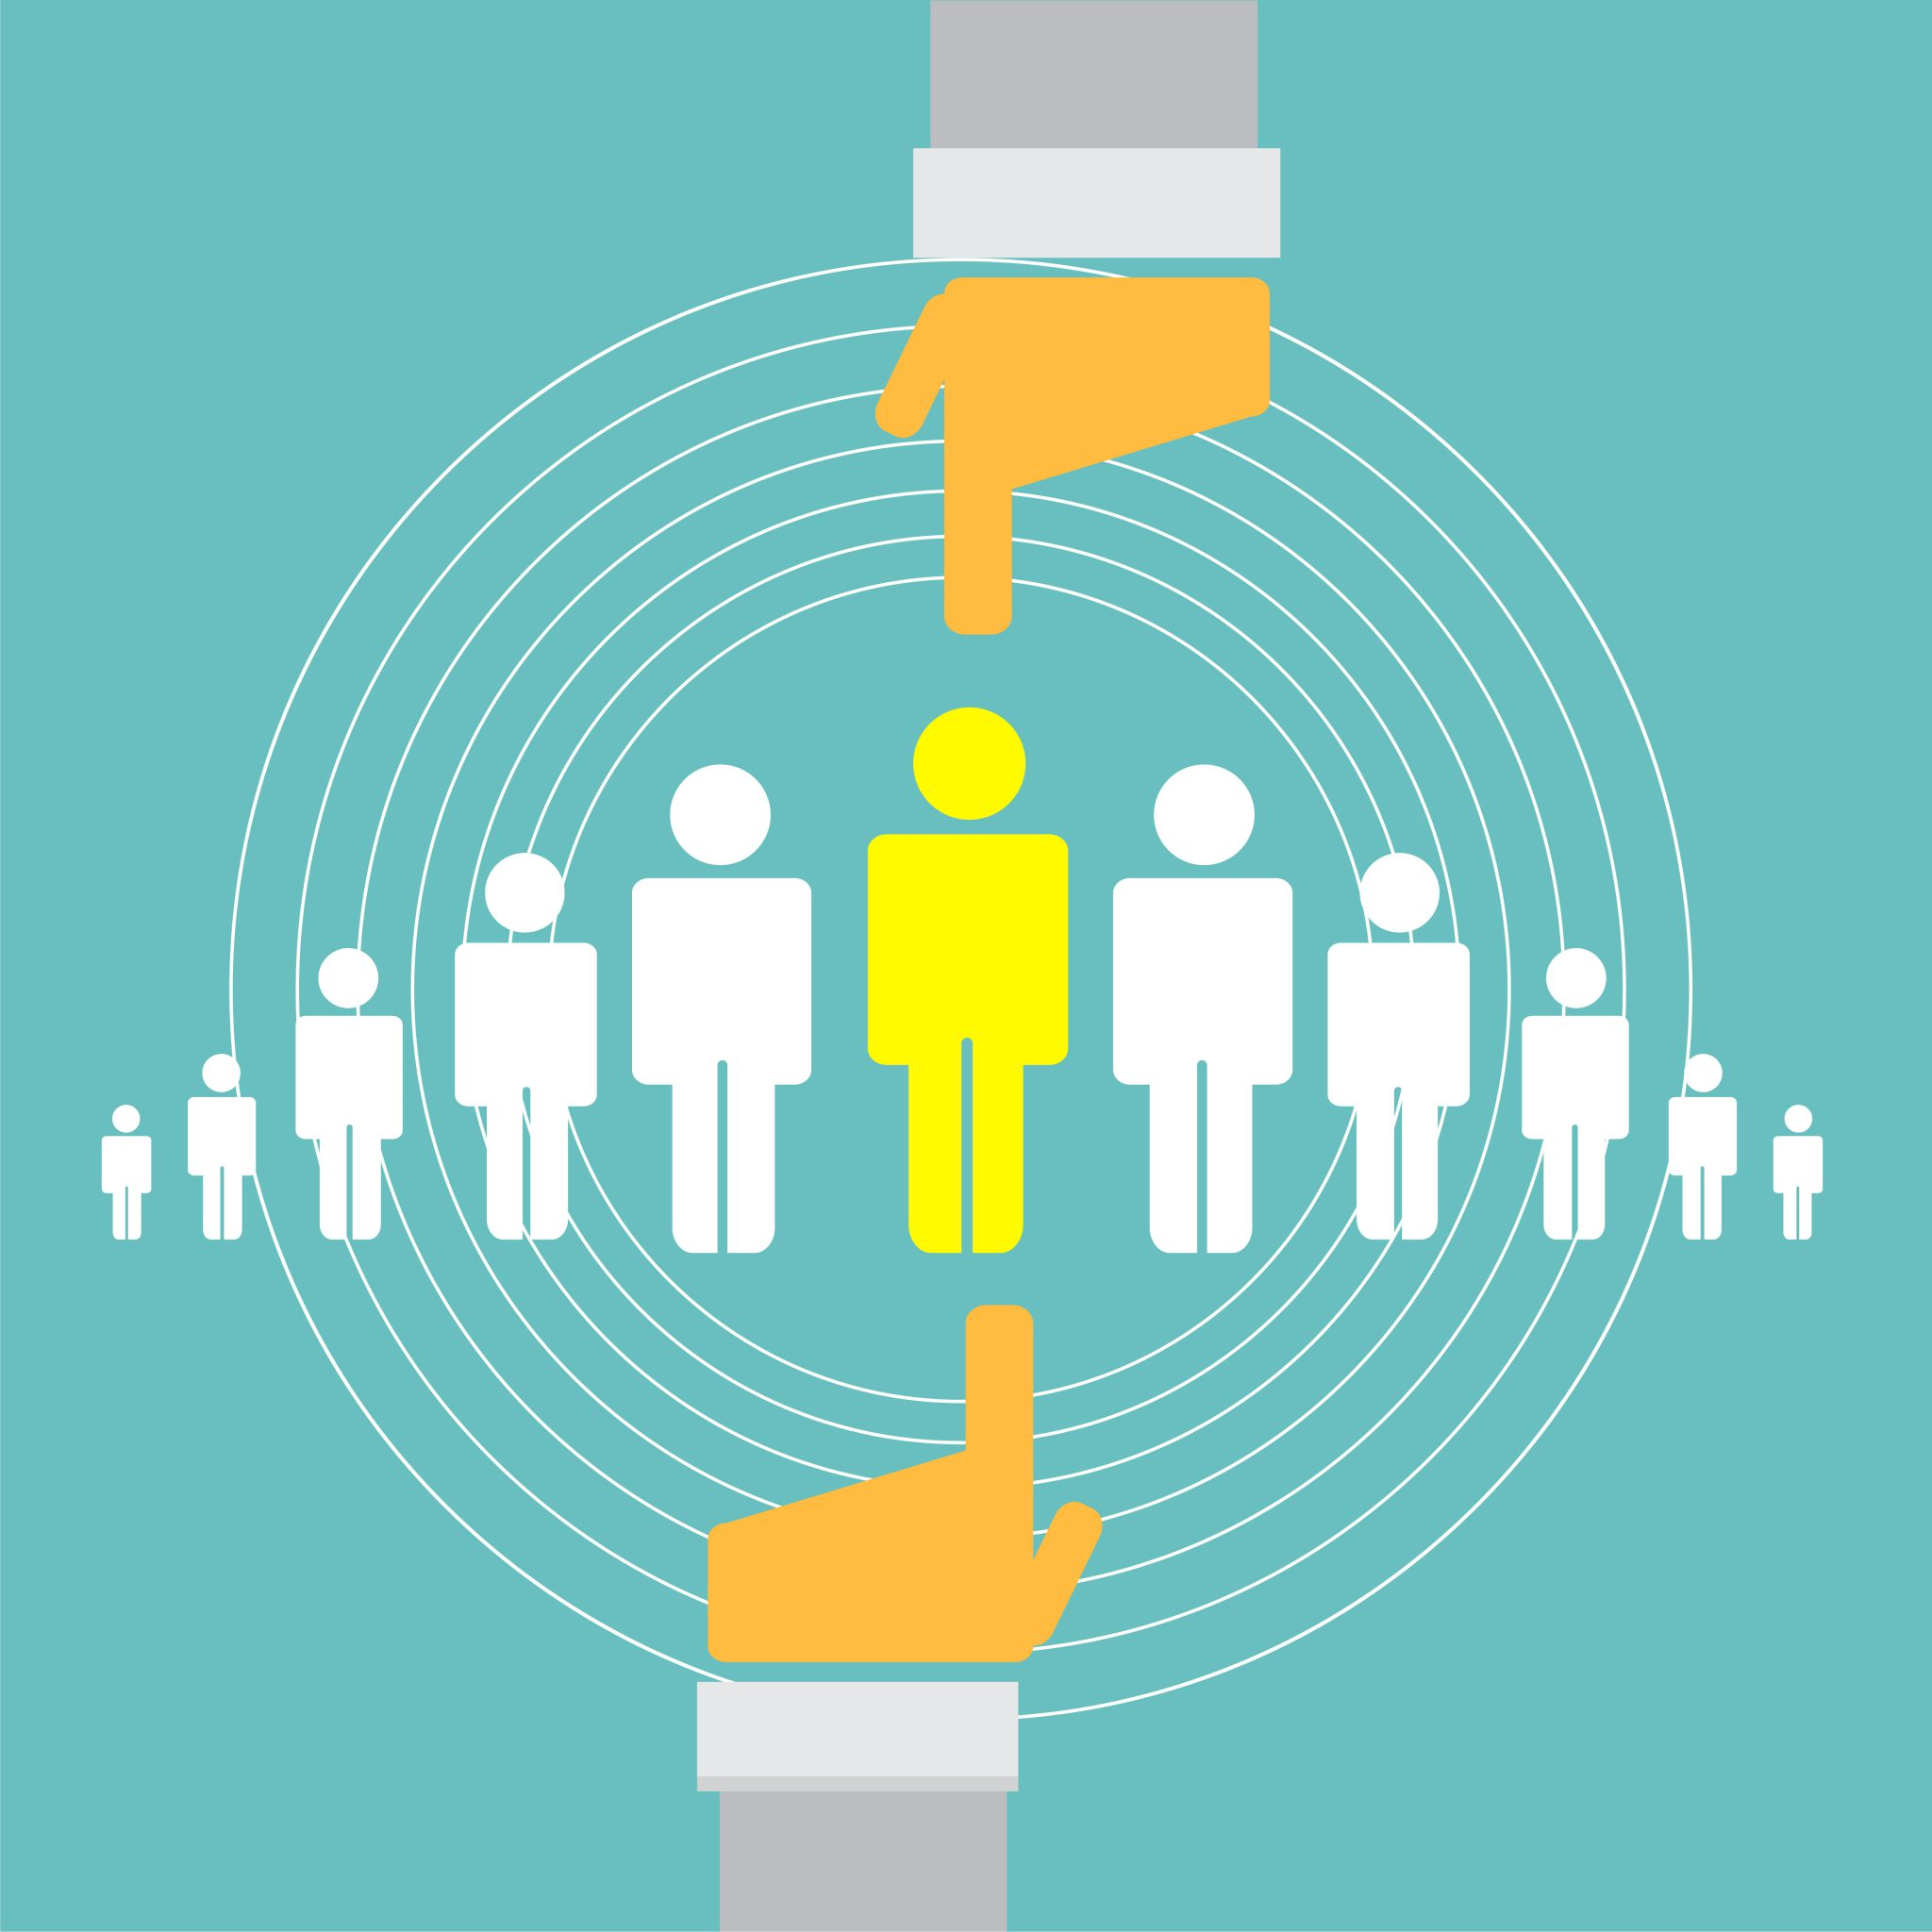 How to Build Organizational Accountability